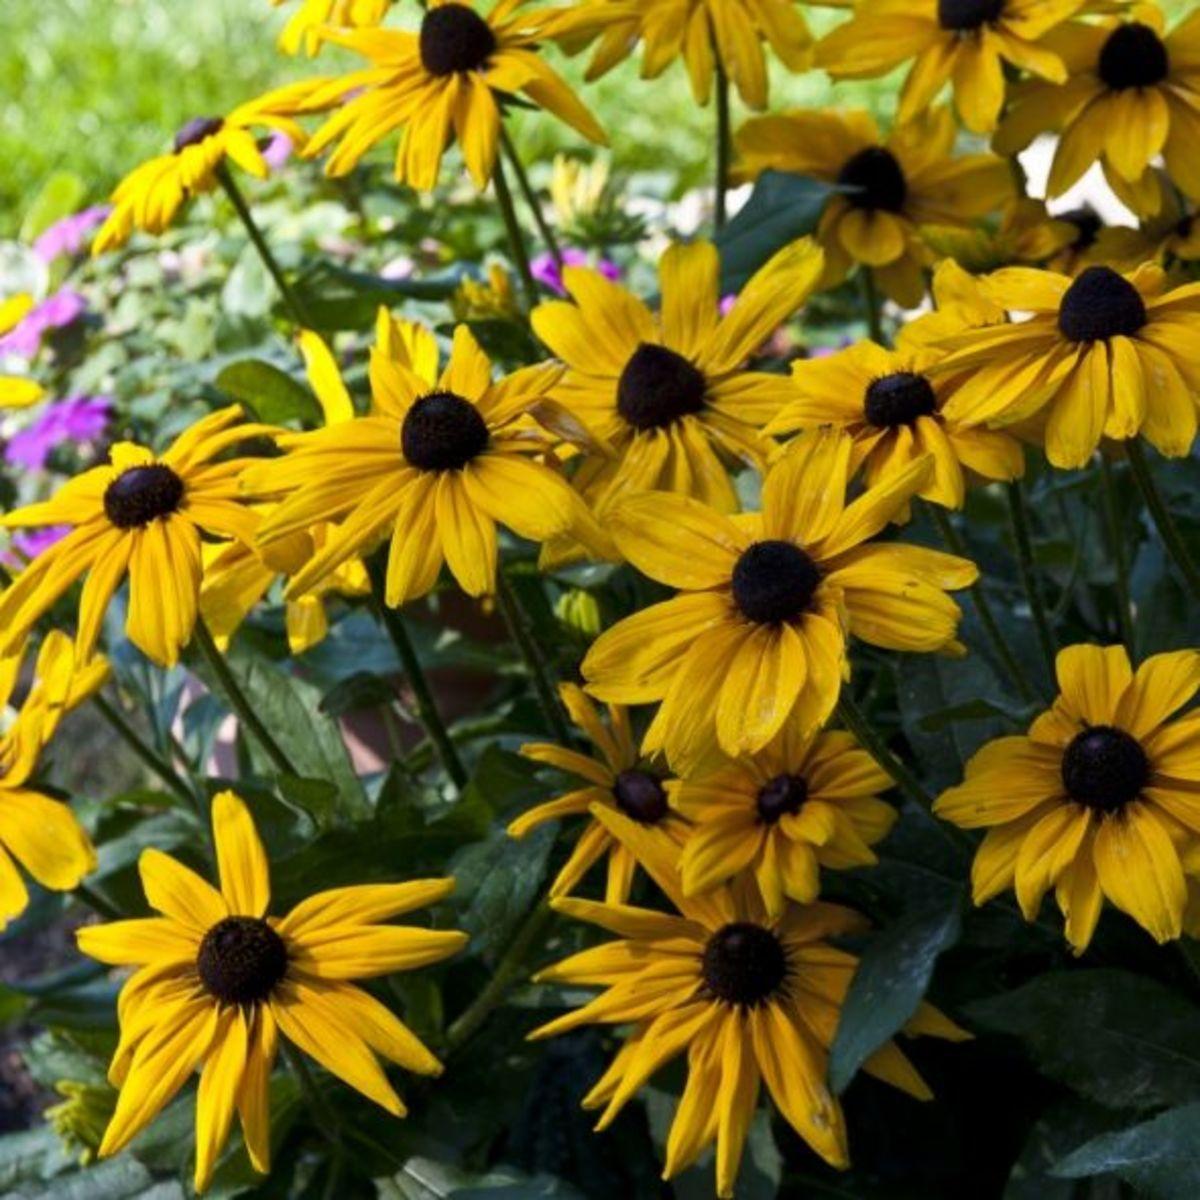 Flowers in the Fairy Garden